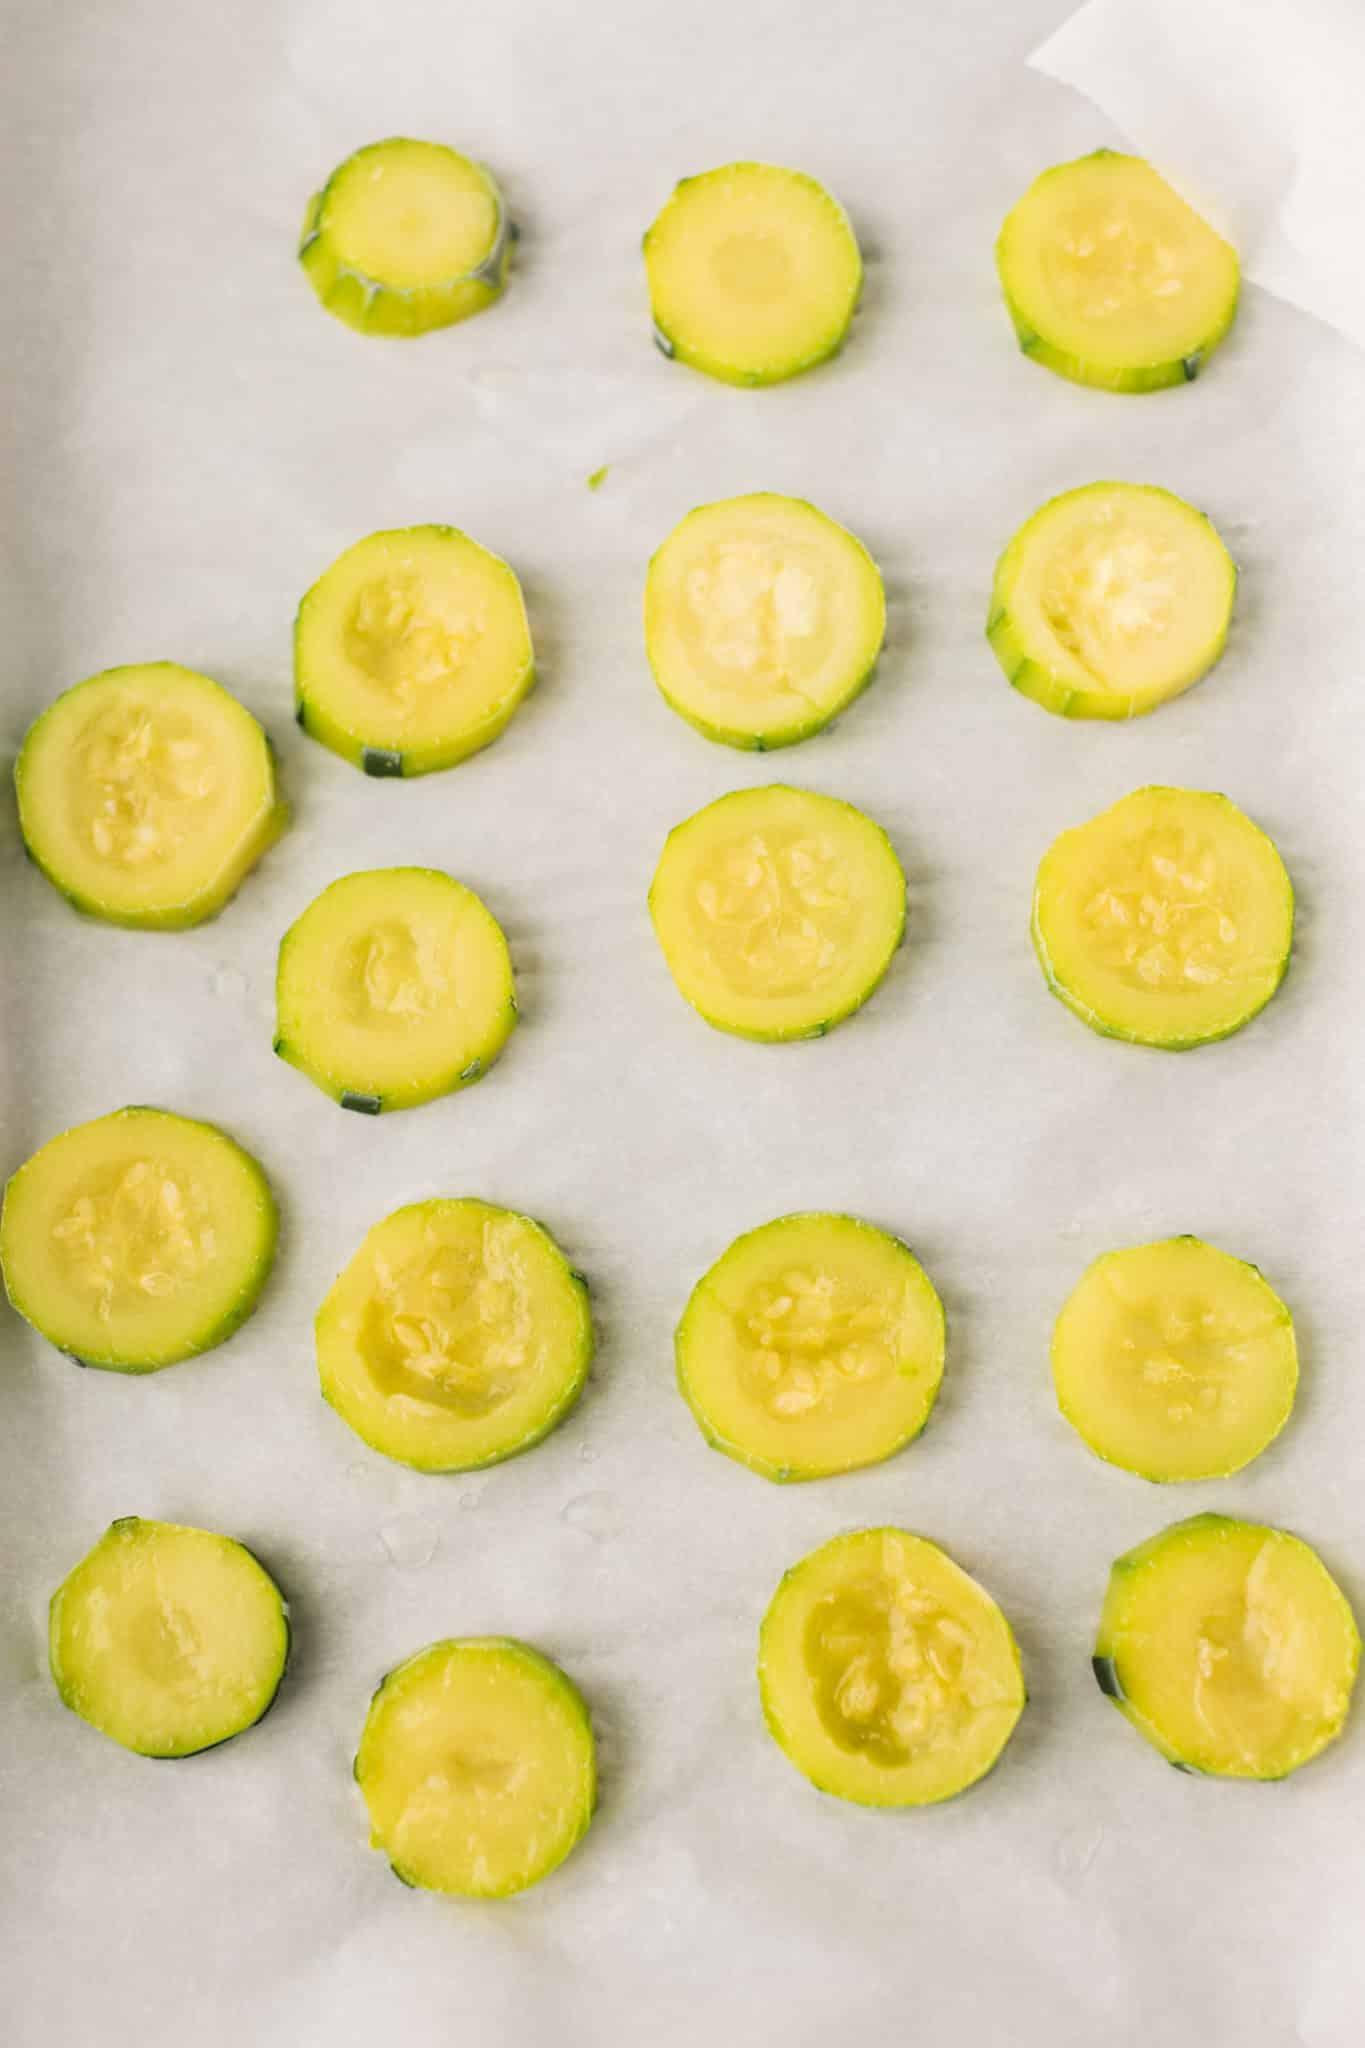 frozen zucchini slices on a baking sheet